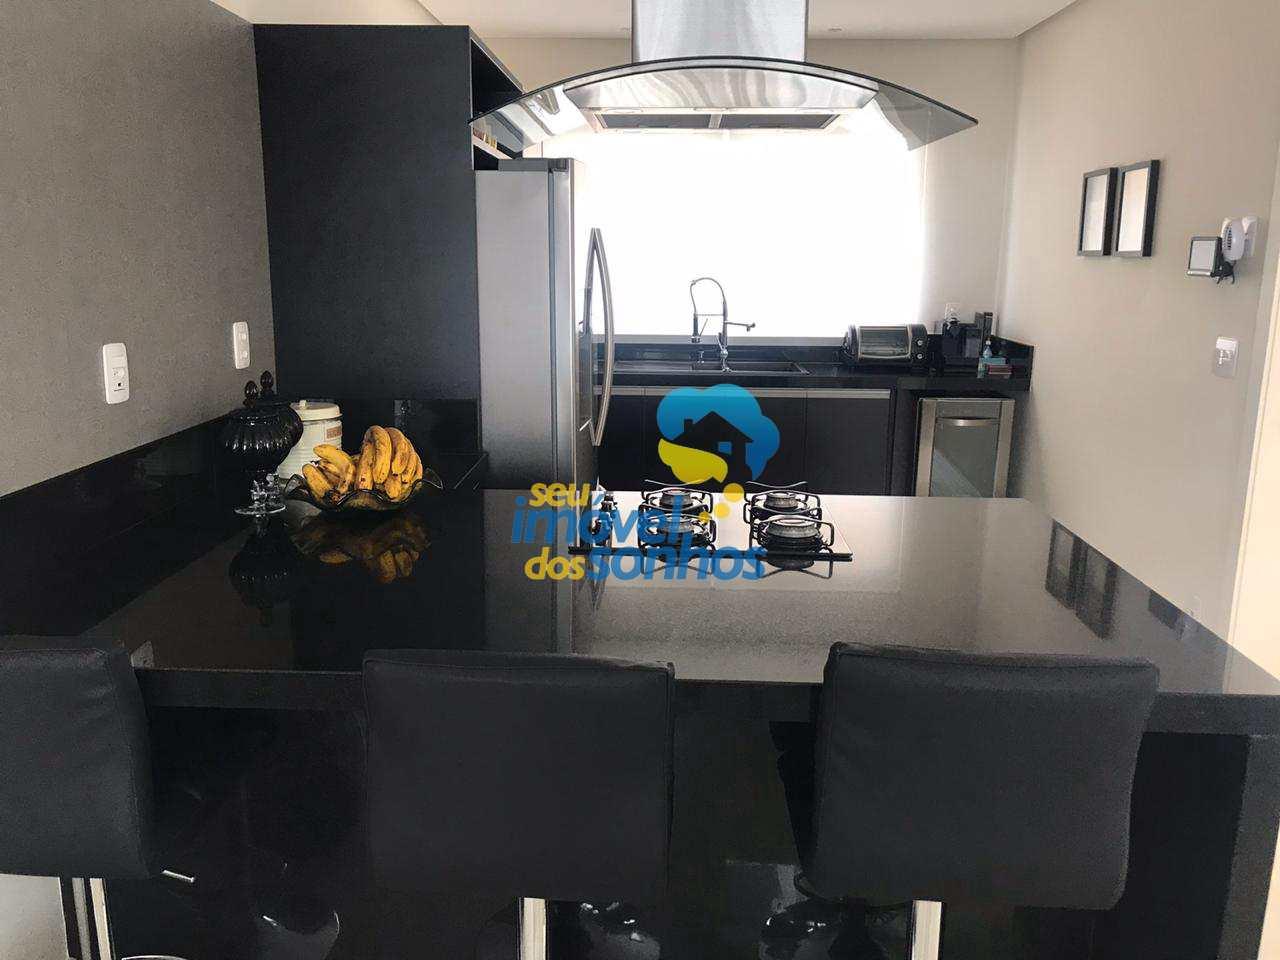 Casa de Condomínio com 4 dorms, Lagos de Santa Helena, Bragança Paulista - R$ 1.2 mi, Cod: 142